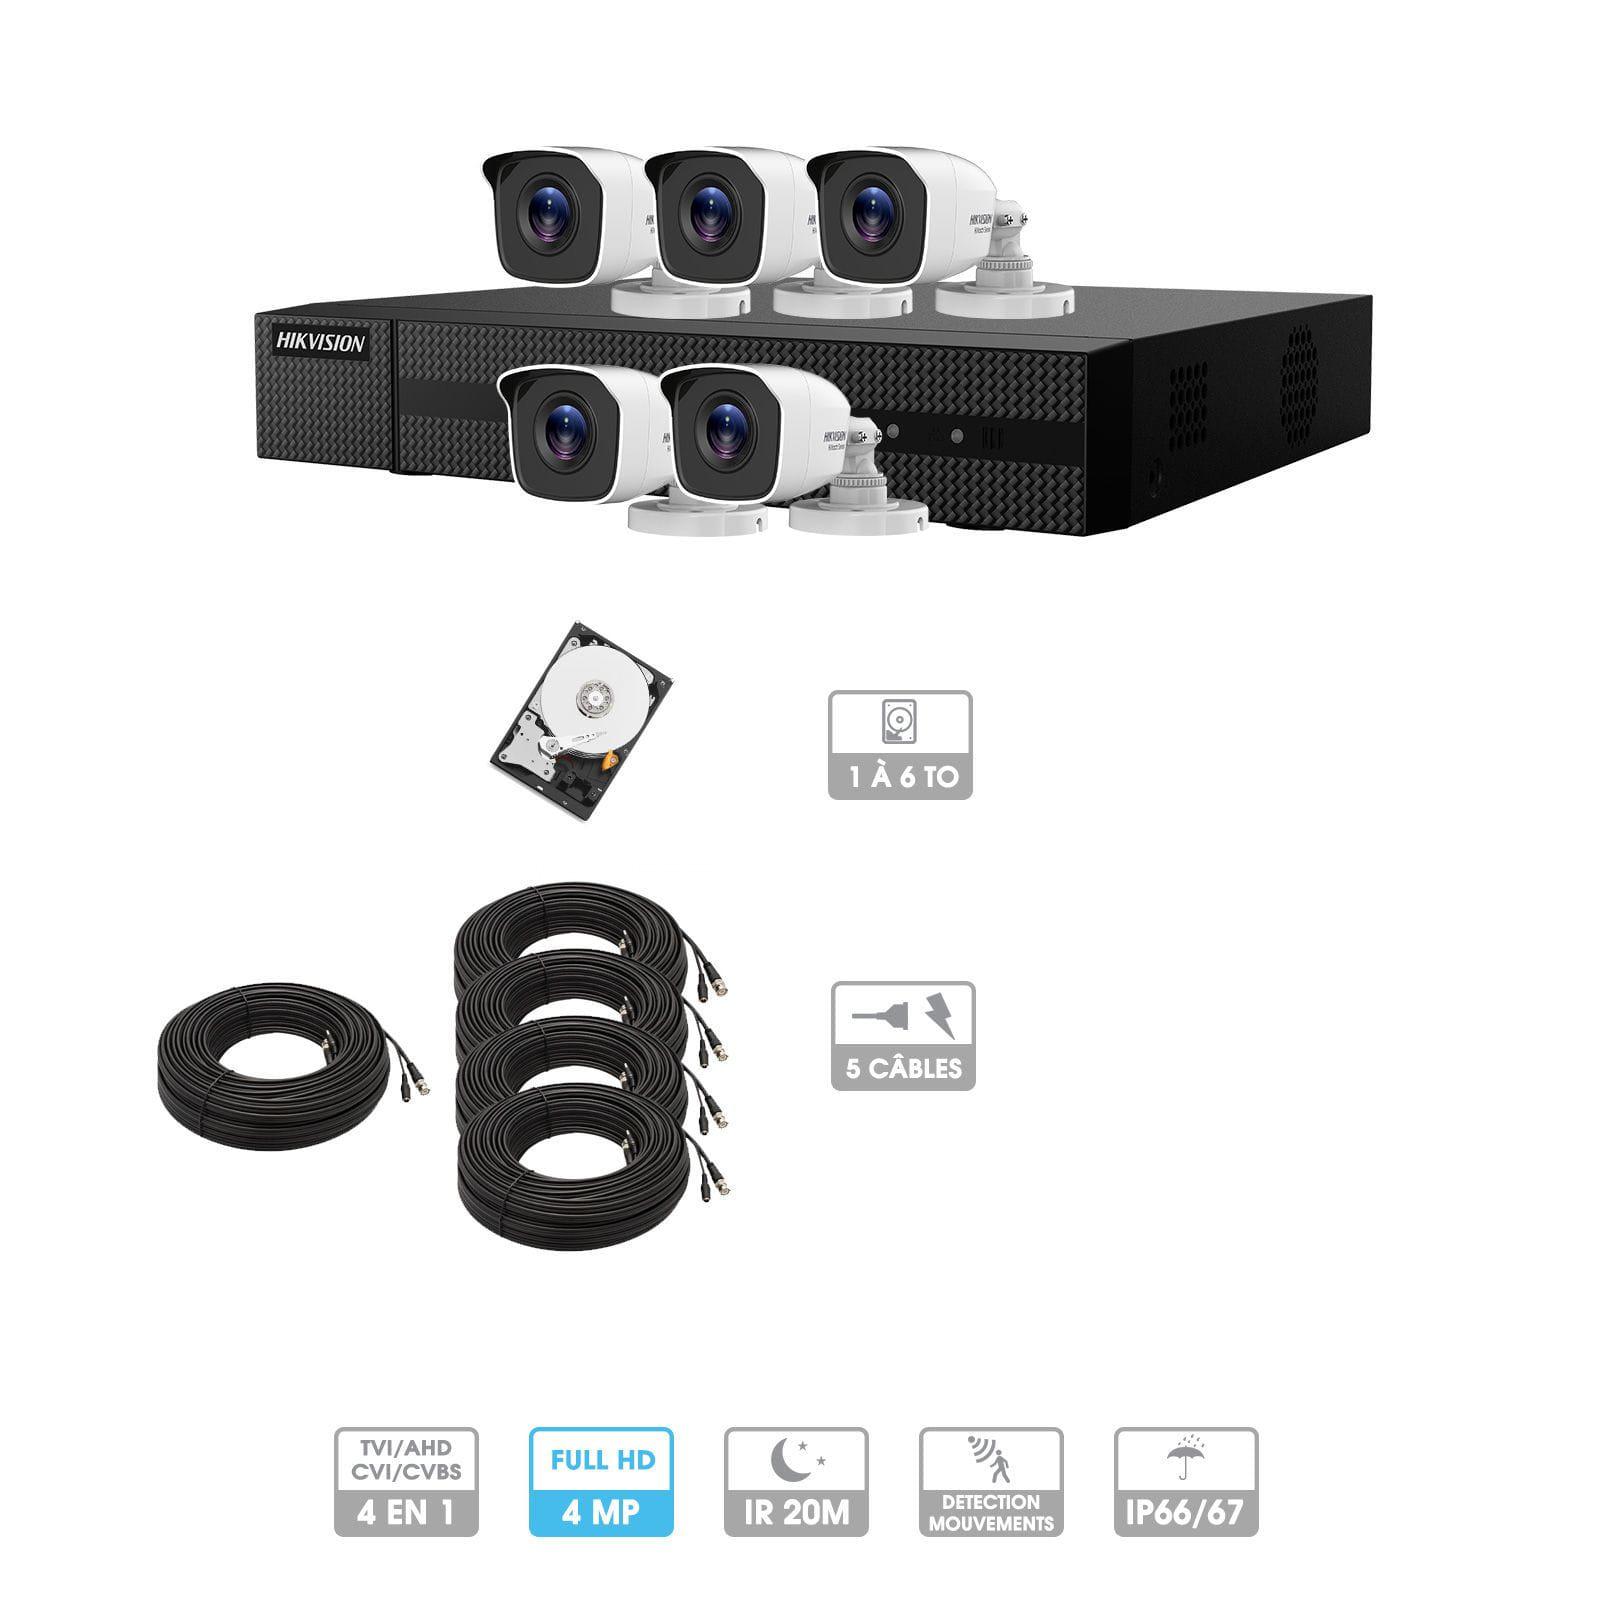 Kit vidéosurveillance 5 caméras | 4MP HD | 5 câbles 20 mètres | HDD 1To | Tube Hiwatch